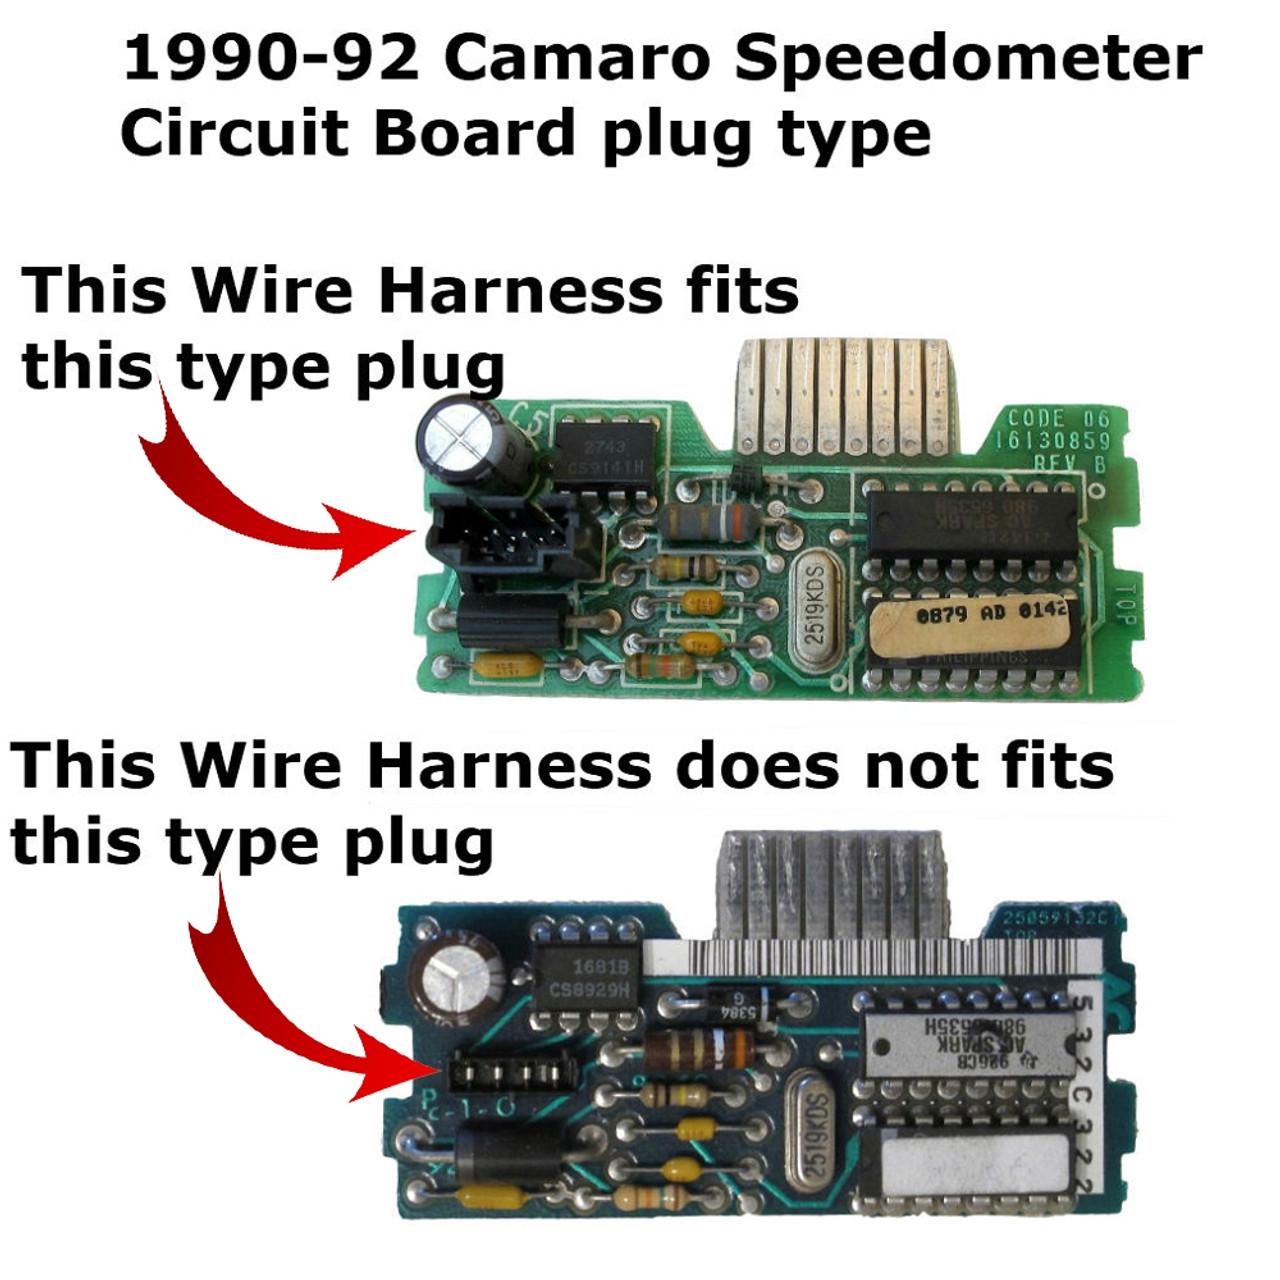 small resolution of 1990 92 chevy camaro speedometer wire harness plug type 2 1990 92 chevy camaro speedometer